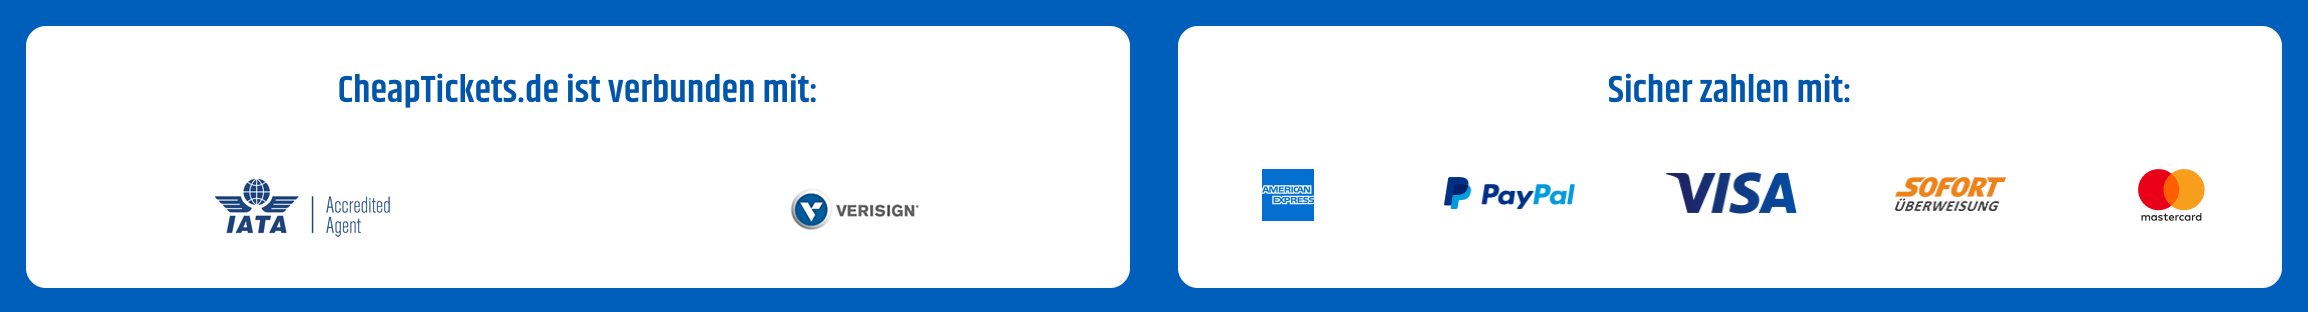 Cheaptickets.de Zahlung ohne Kreditkarte